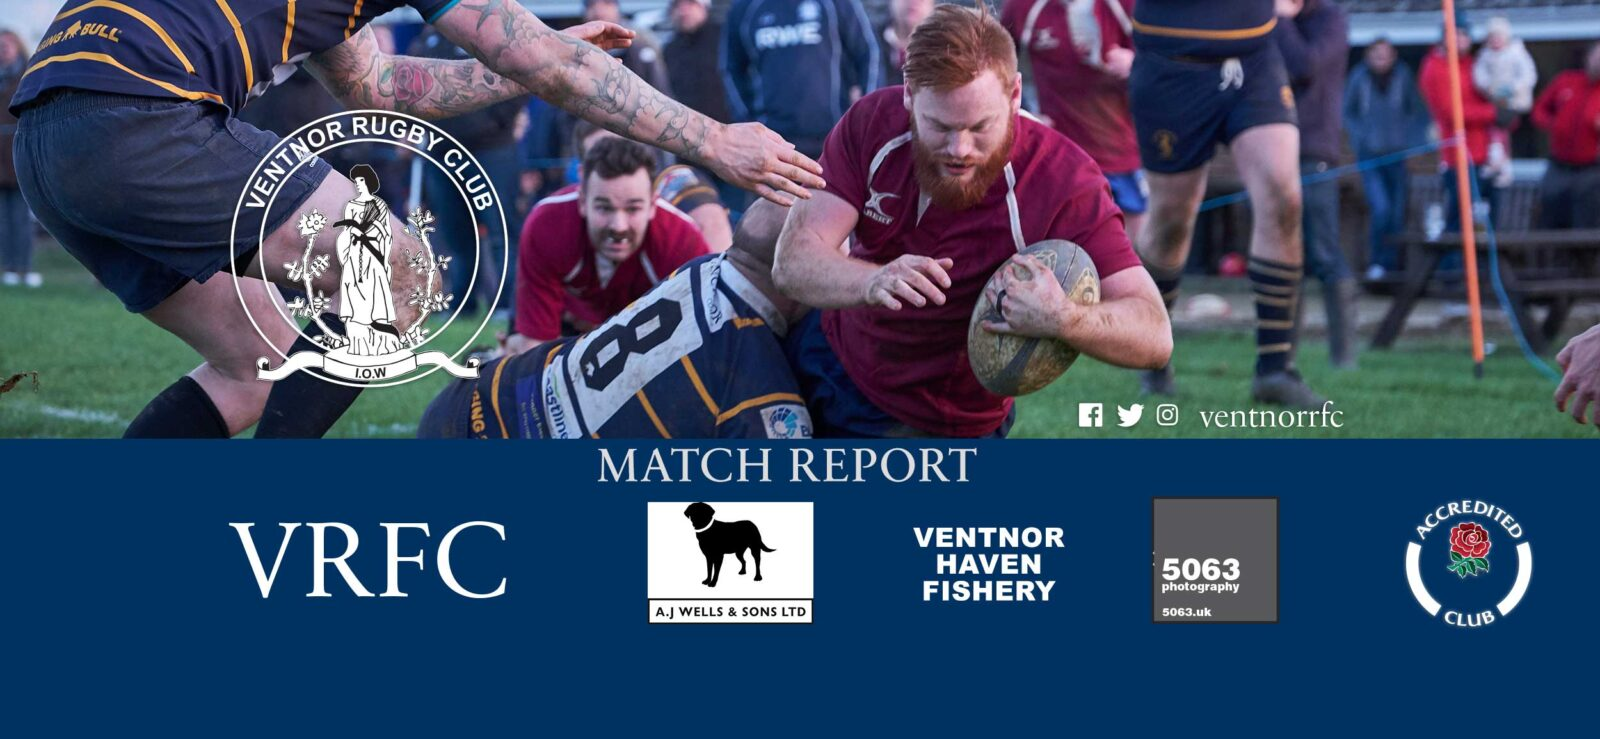 Match report: Ventnor RFC 1st XV v Isle of Wight RFC 1st XV, 25/11/2017